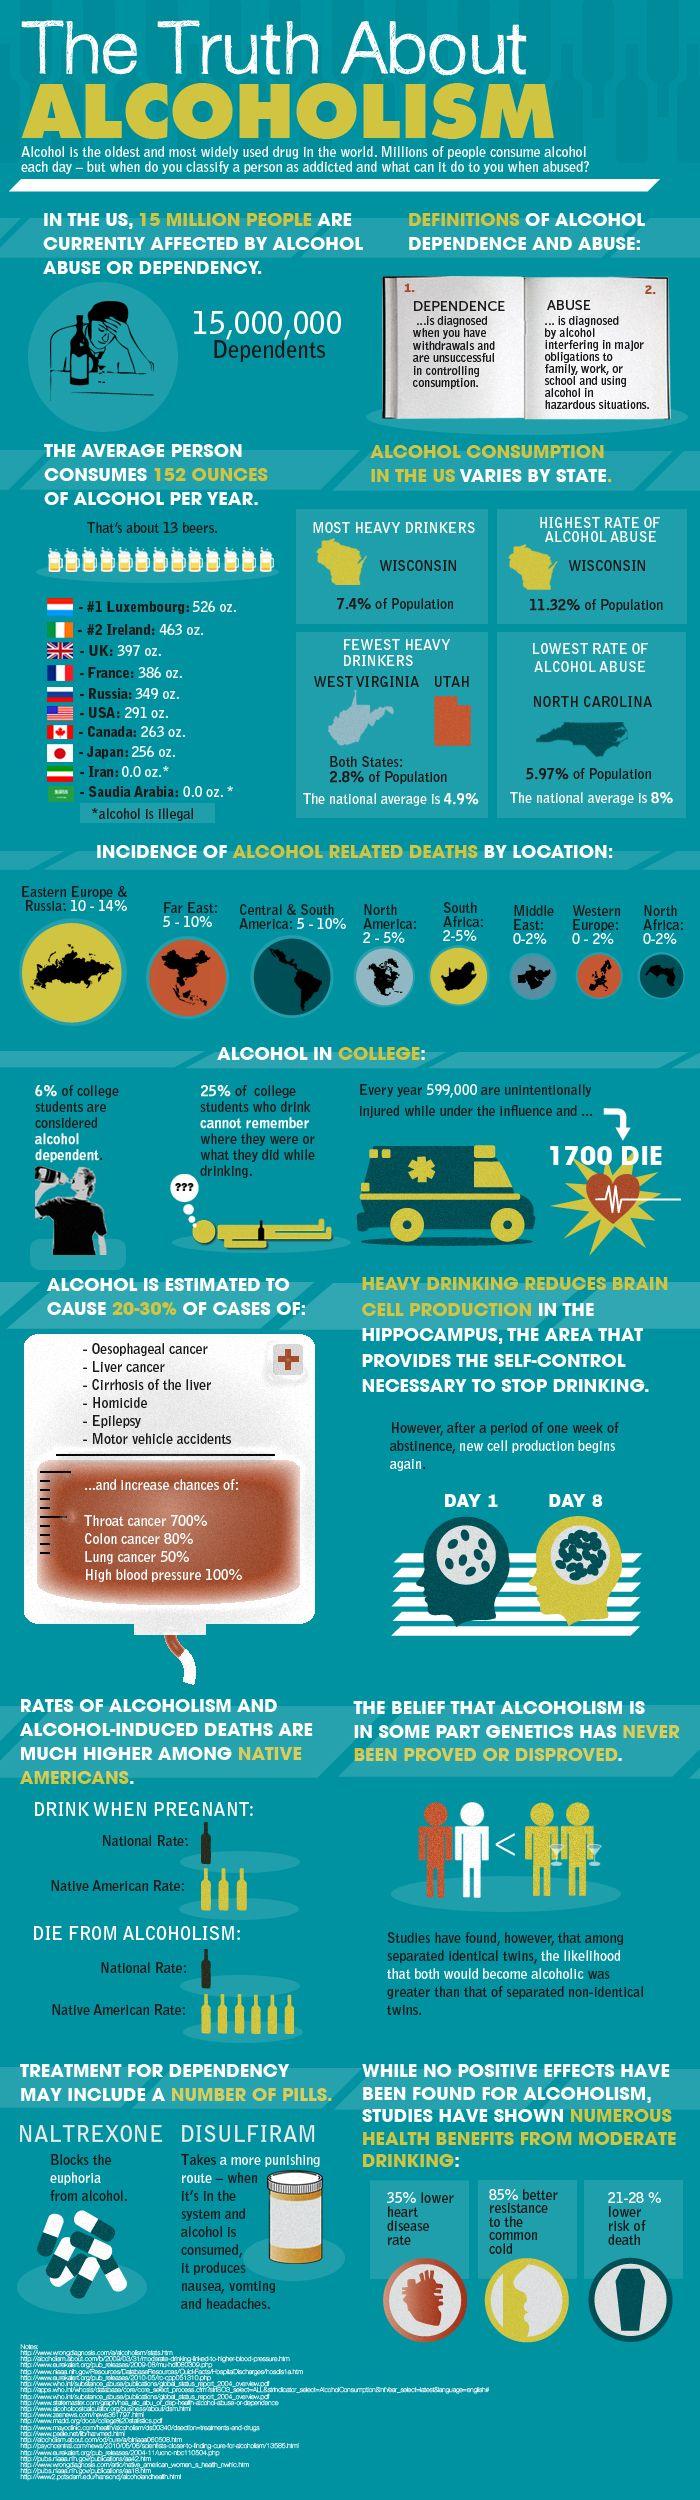 La verdad sobre el alcoholismo - #infografia / The truth about alcoholism - #infographic